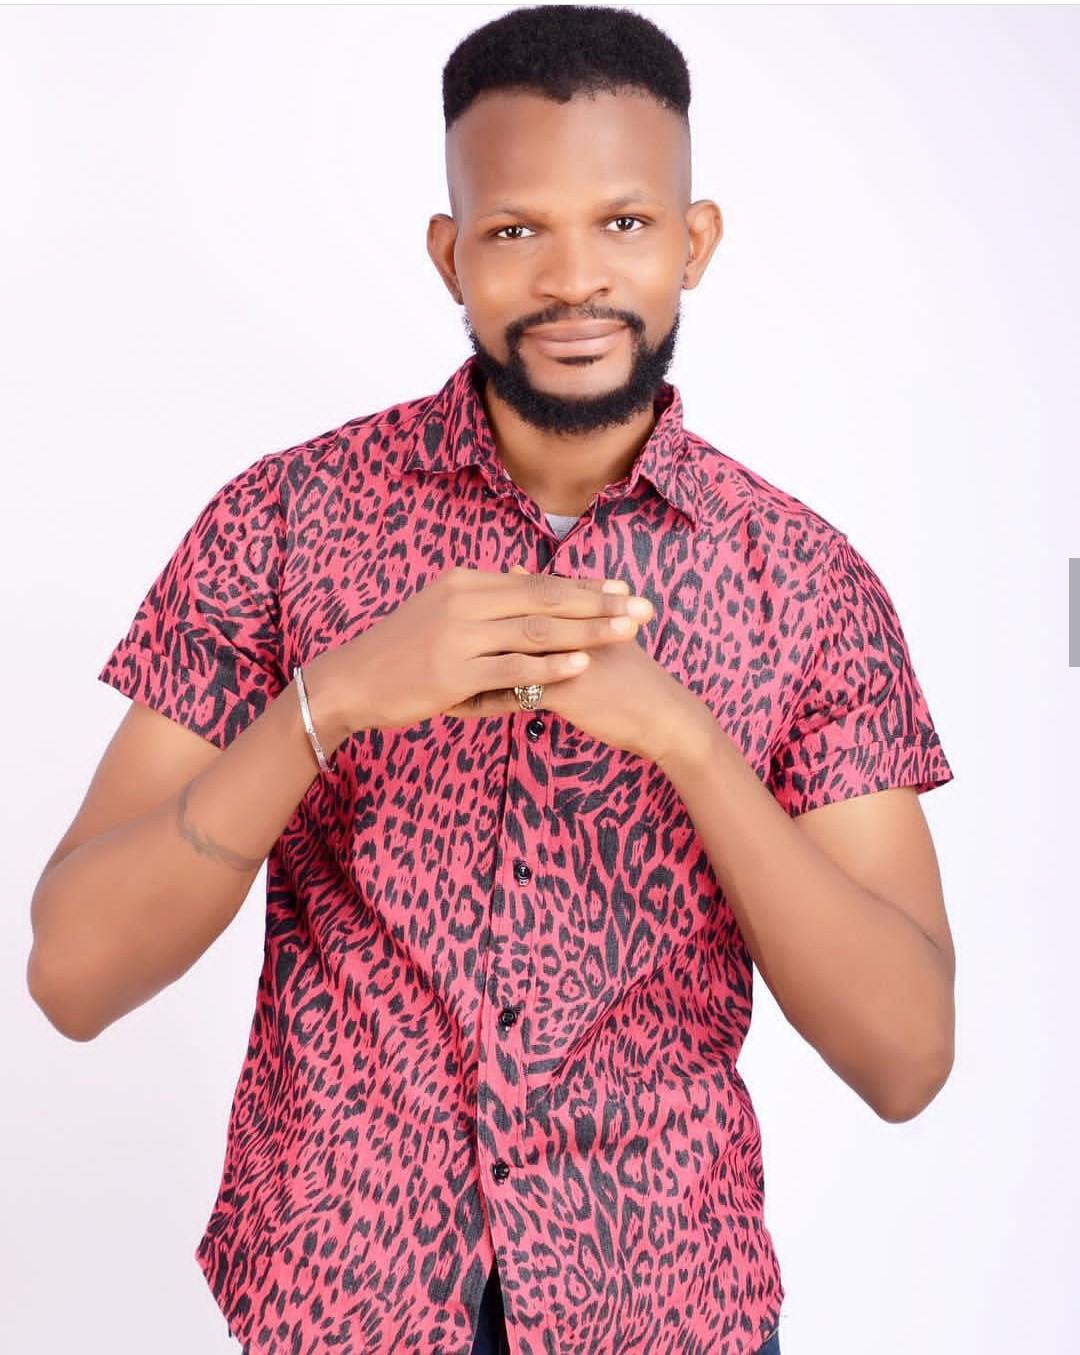 """The bible is not responsible for your spiritual mumu, beg Mercy for intelligence"" – Uche Maduagwu slams Etinosa"